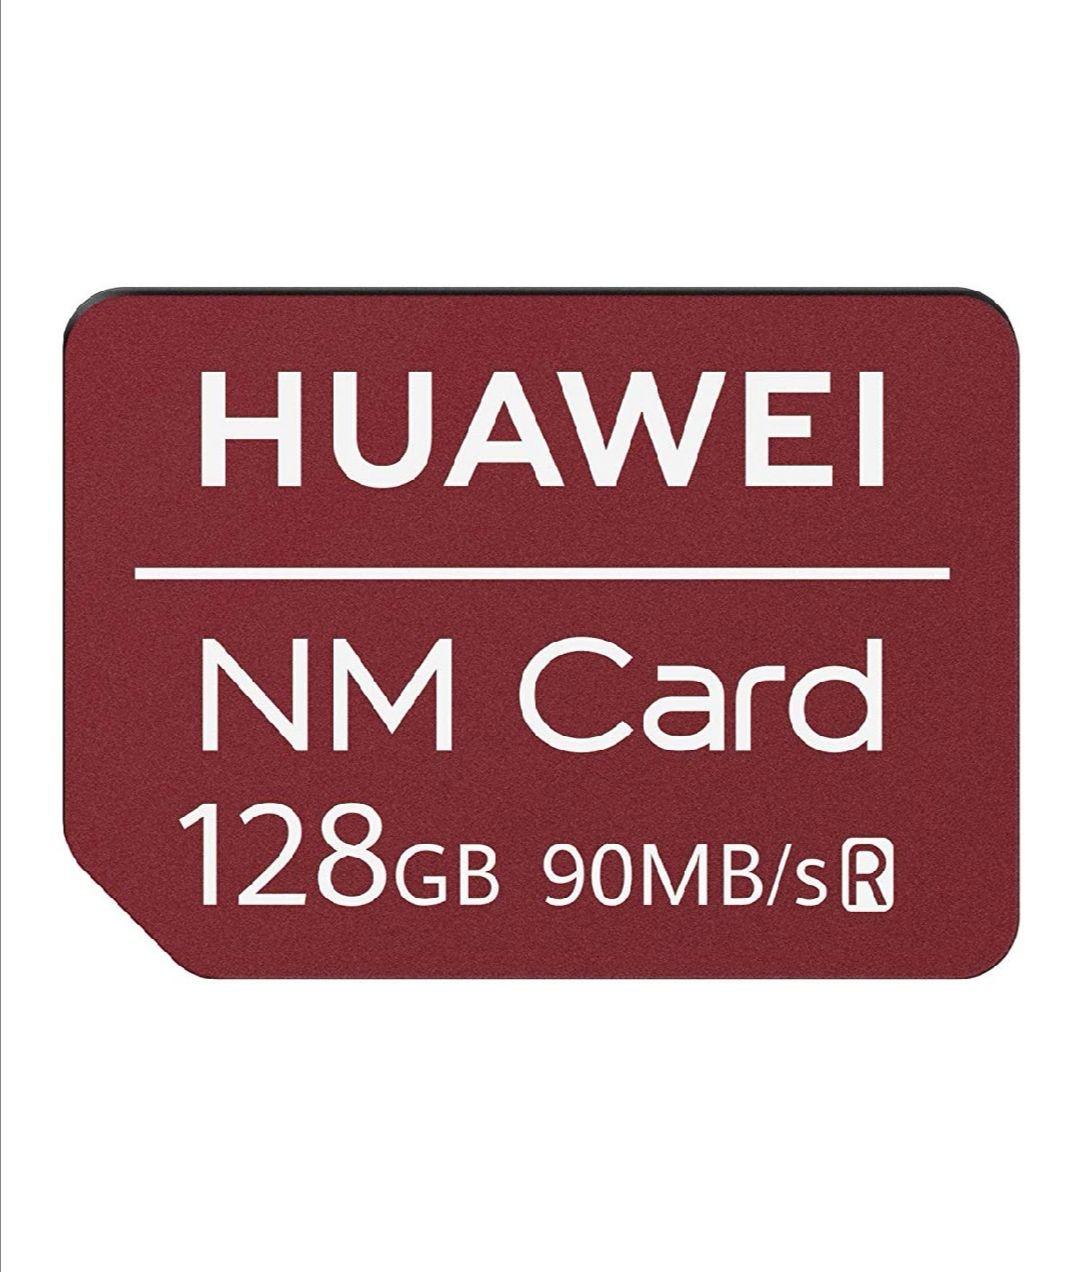 Huawei Universal Nano 128 GB Memory Card  £39.74 @ Amazon